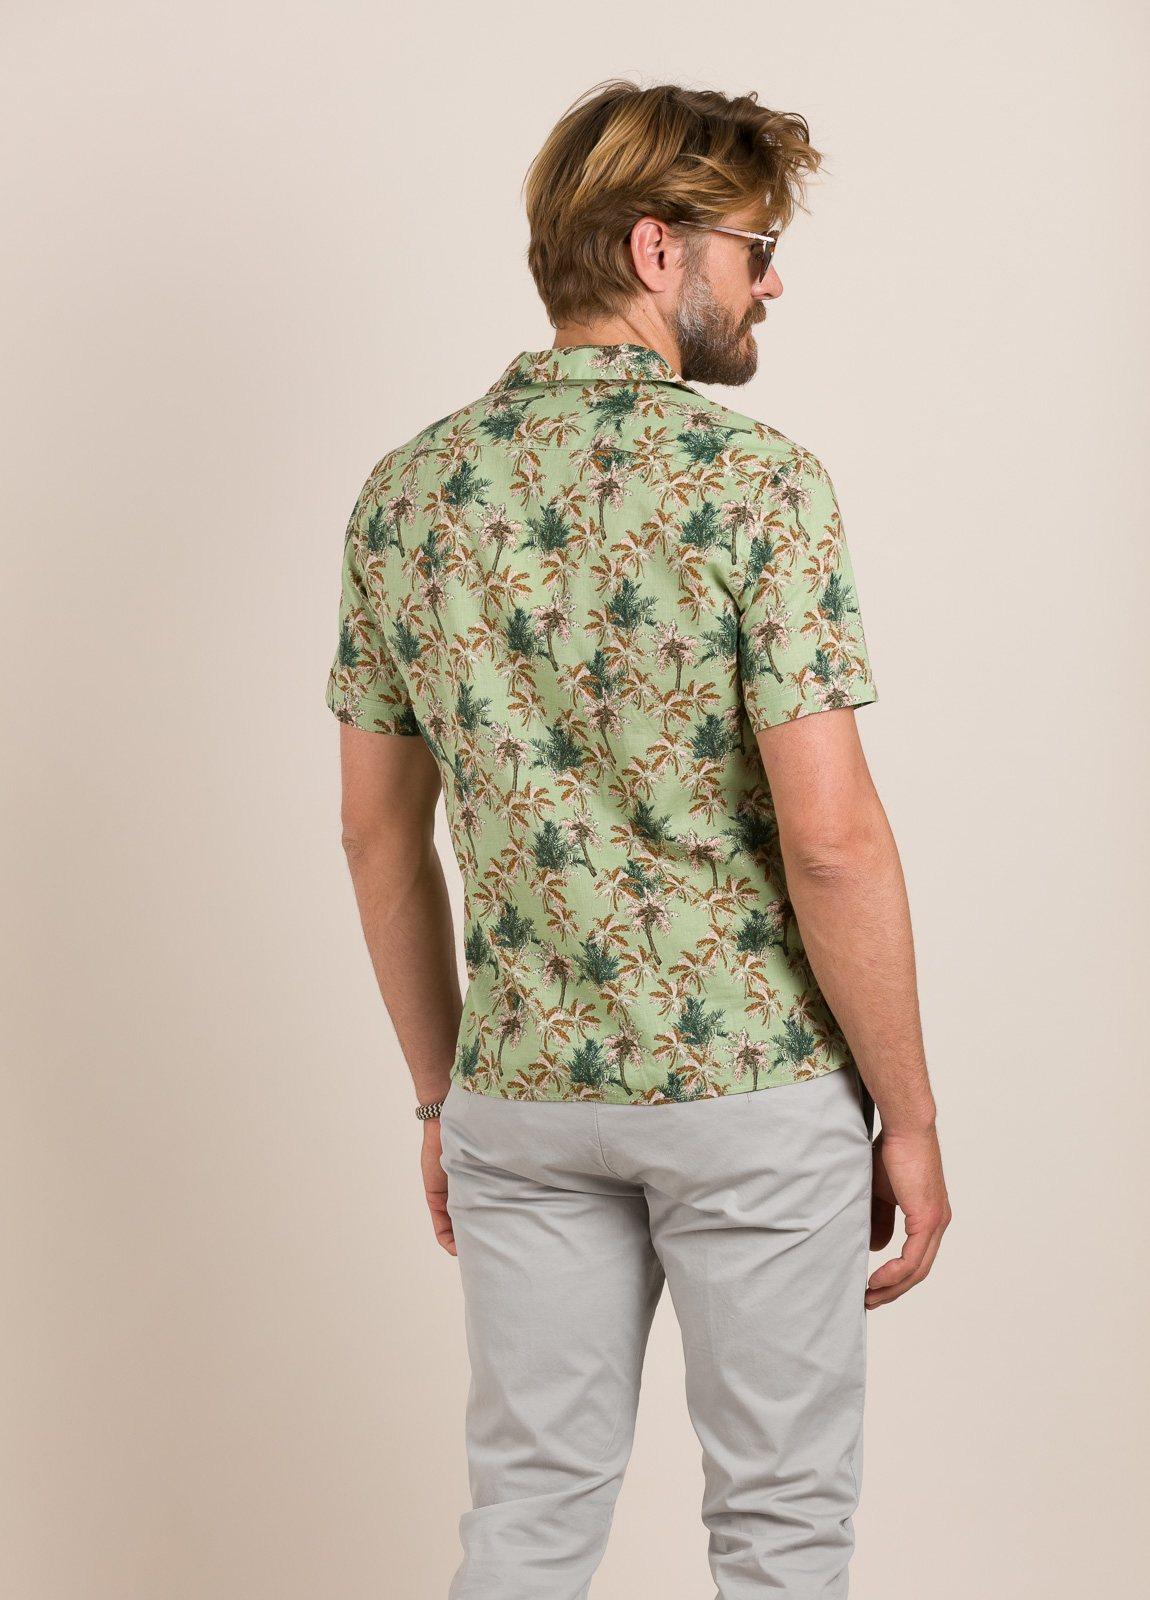 Camisa sport FUREST COLECCIÓN modelo HAWAI verde - Ítem5